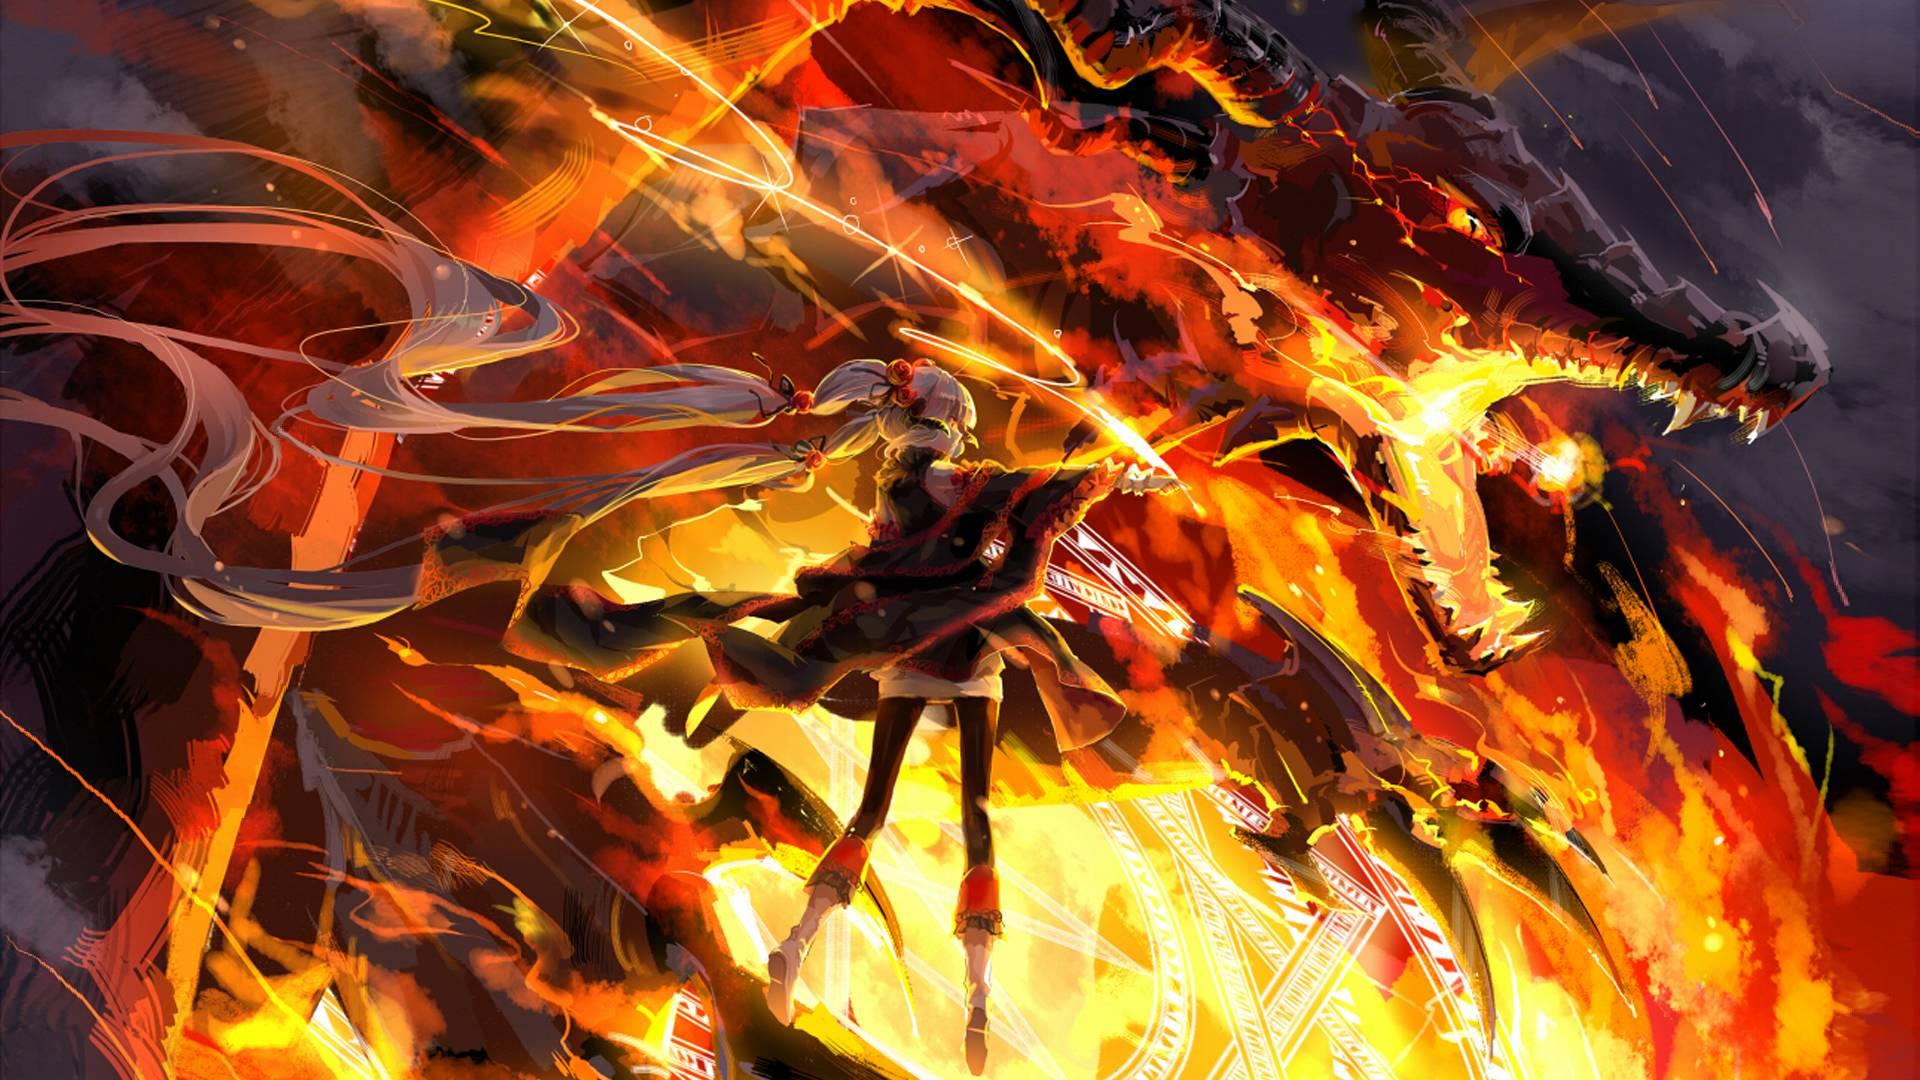 anime wallpaper 1 - photo #19